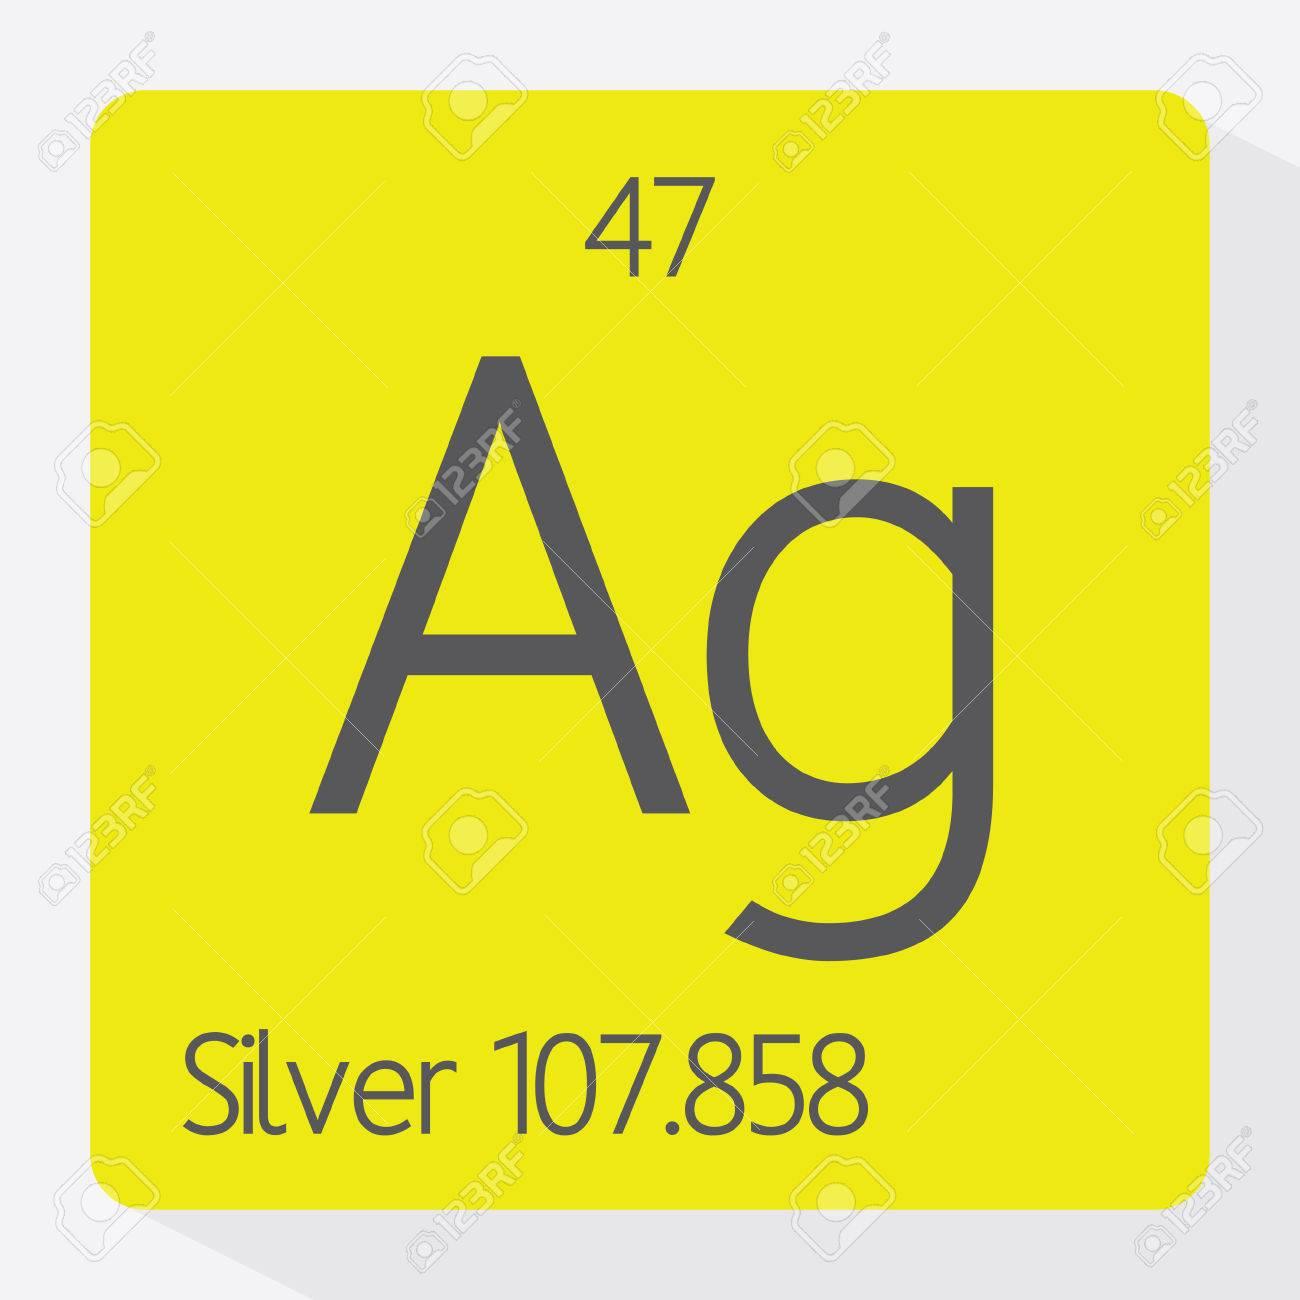 Periodic table silver royalty free cliparts vectors and stock periodic table silver stock vector 41235665 buycottarizona